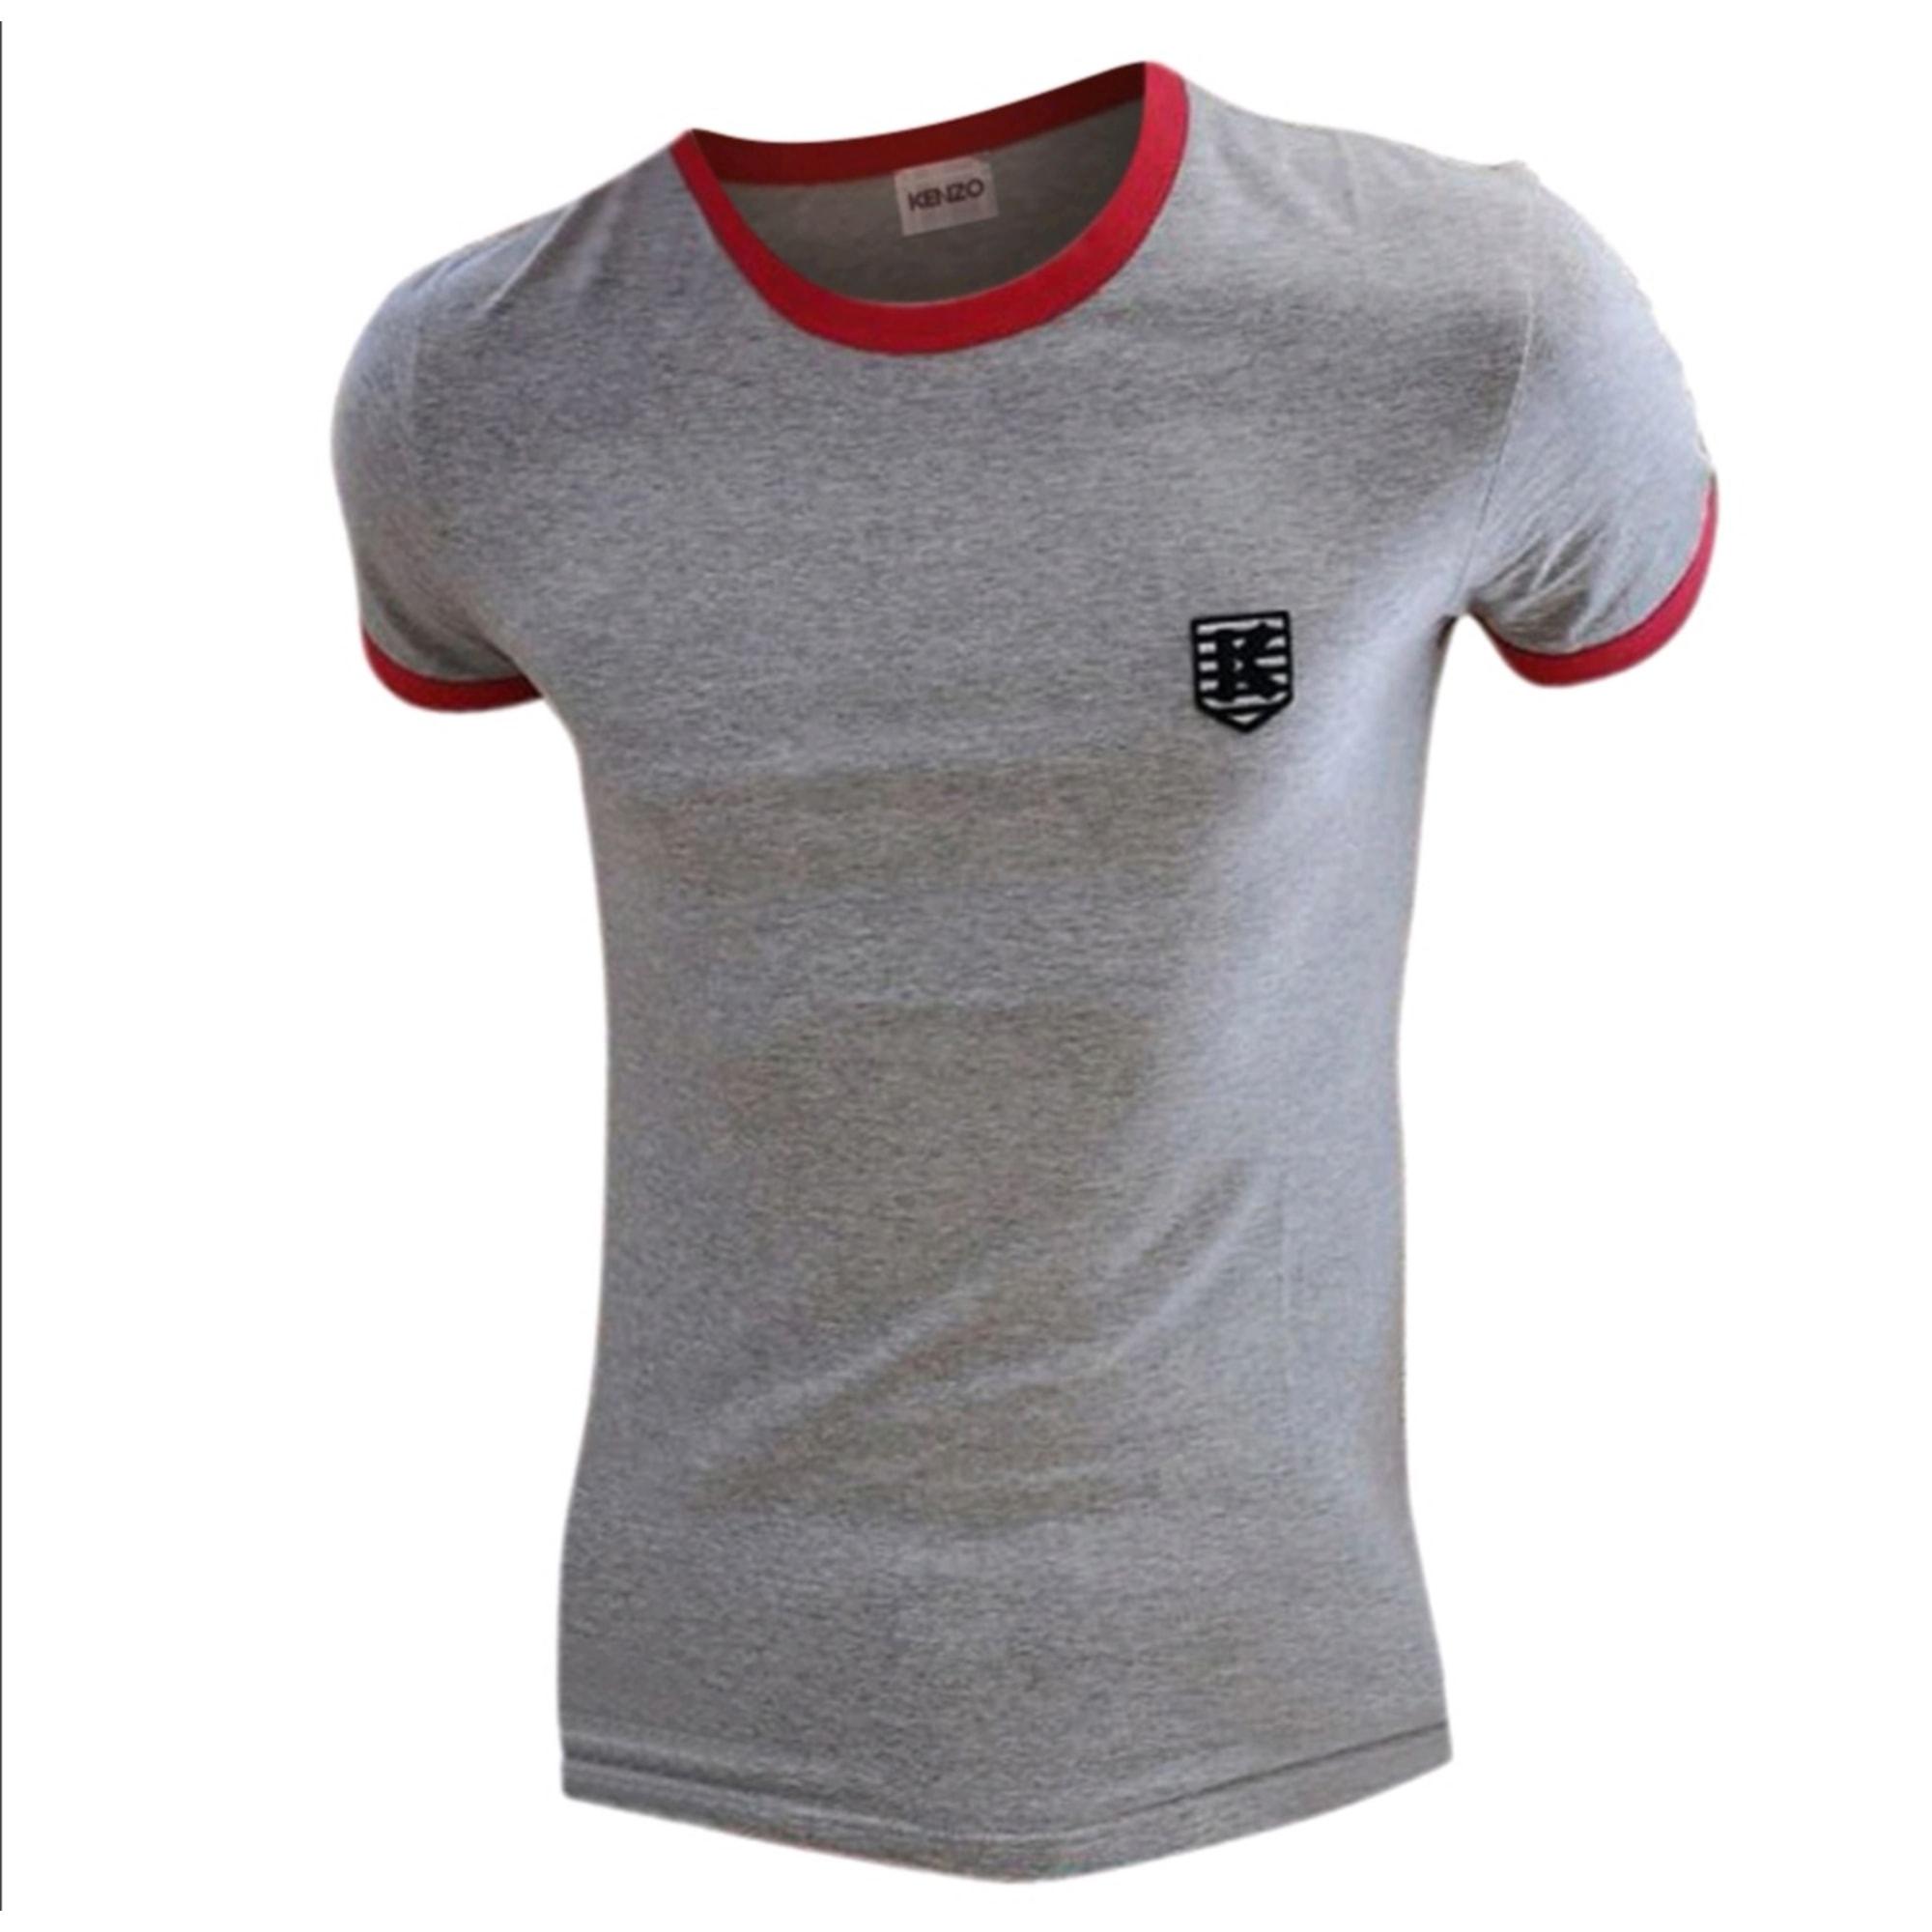 T-shirt KENZO Gray, charcoal